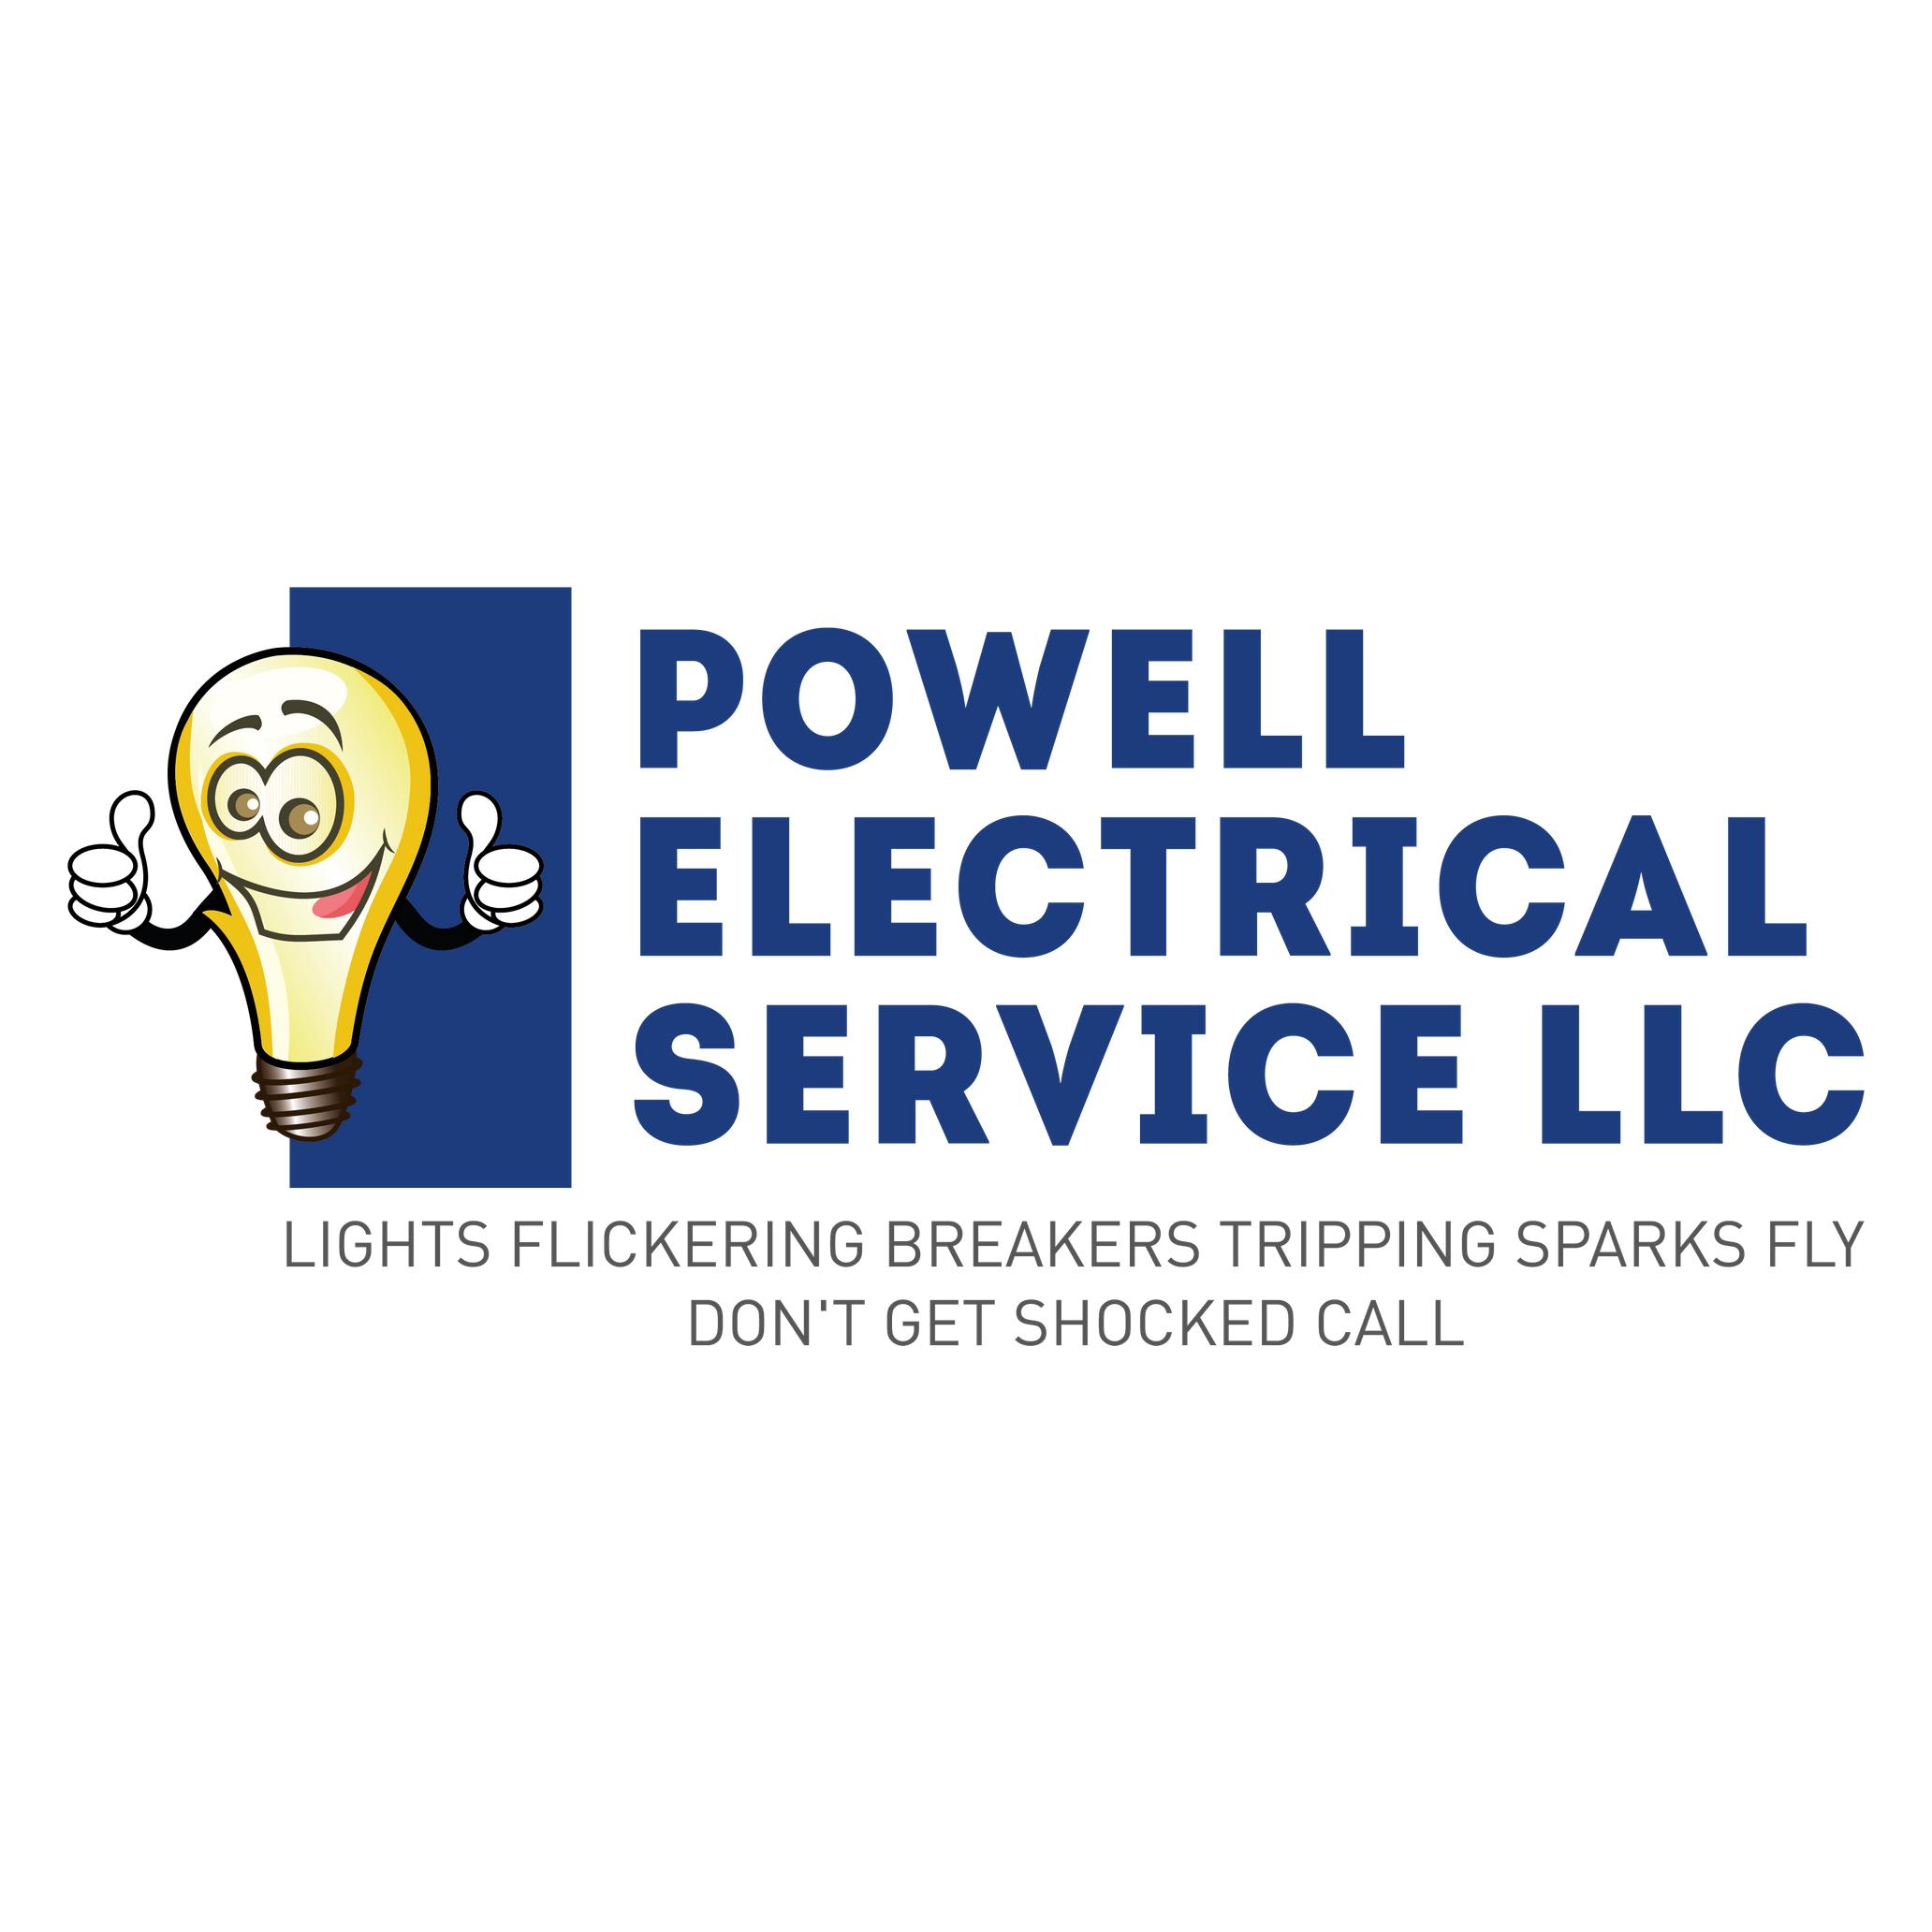 Powell Electrical Service, Llc